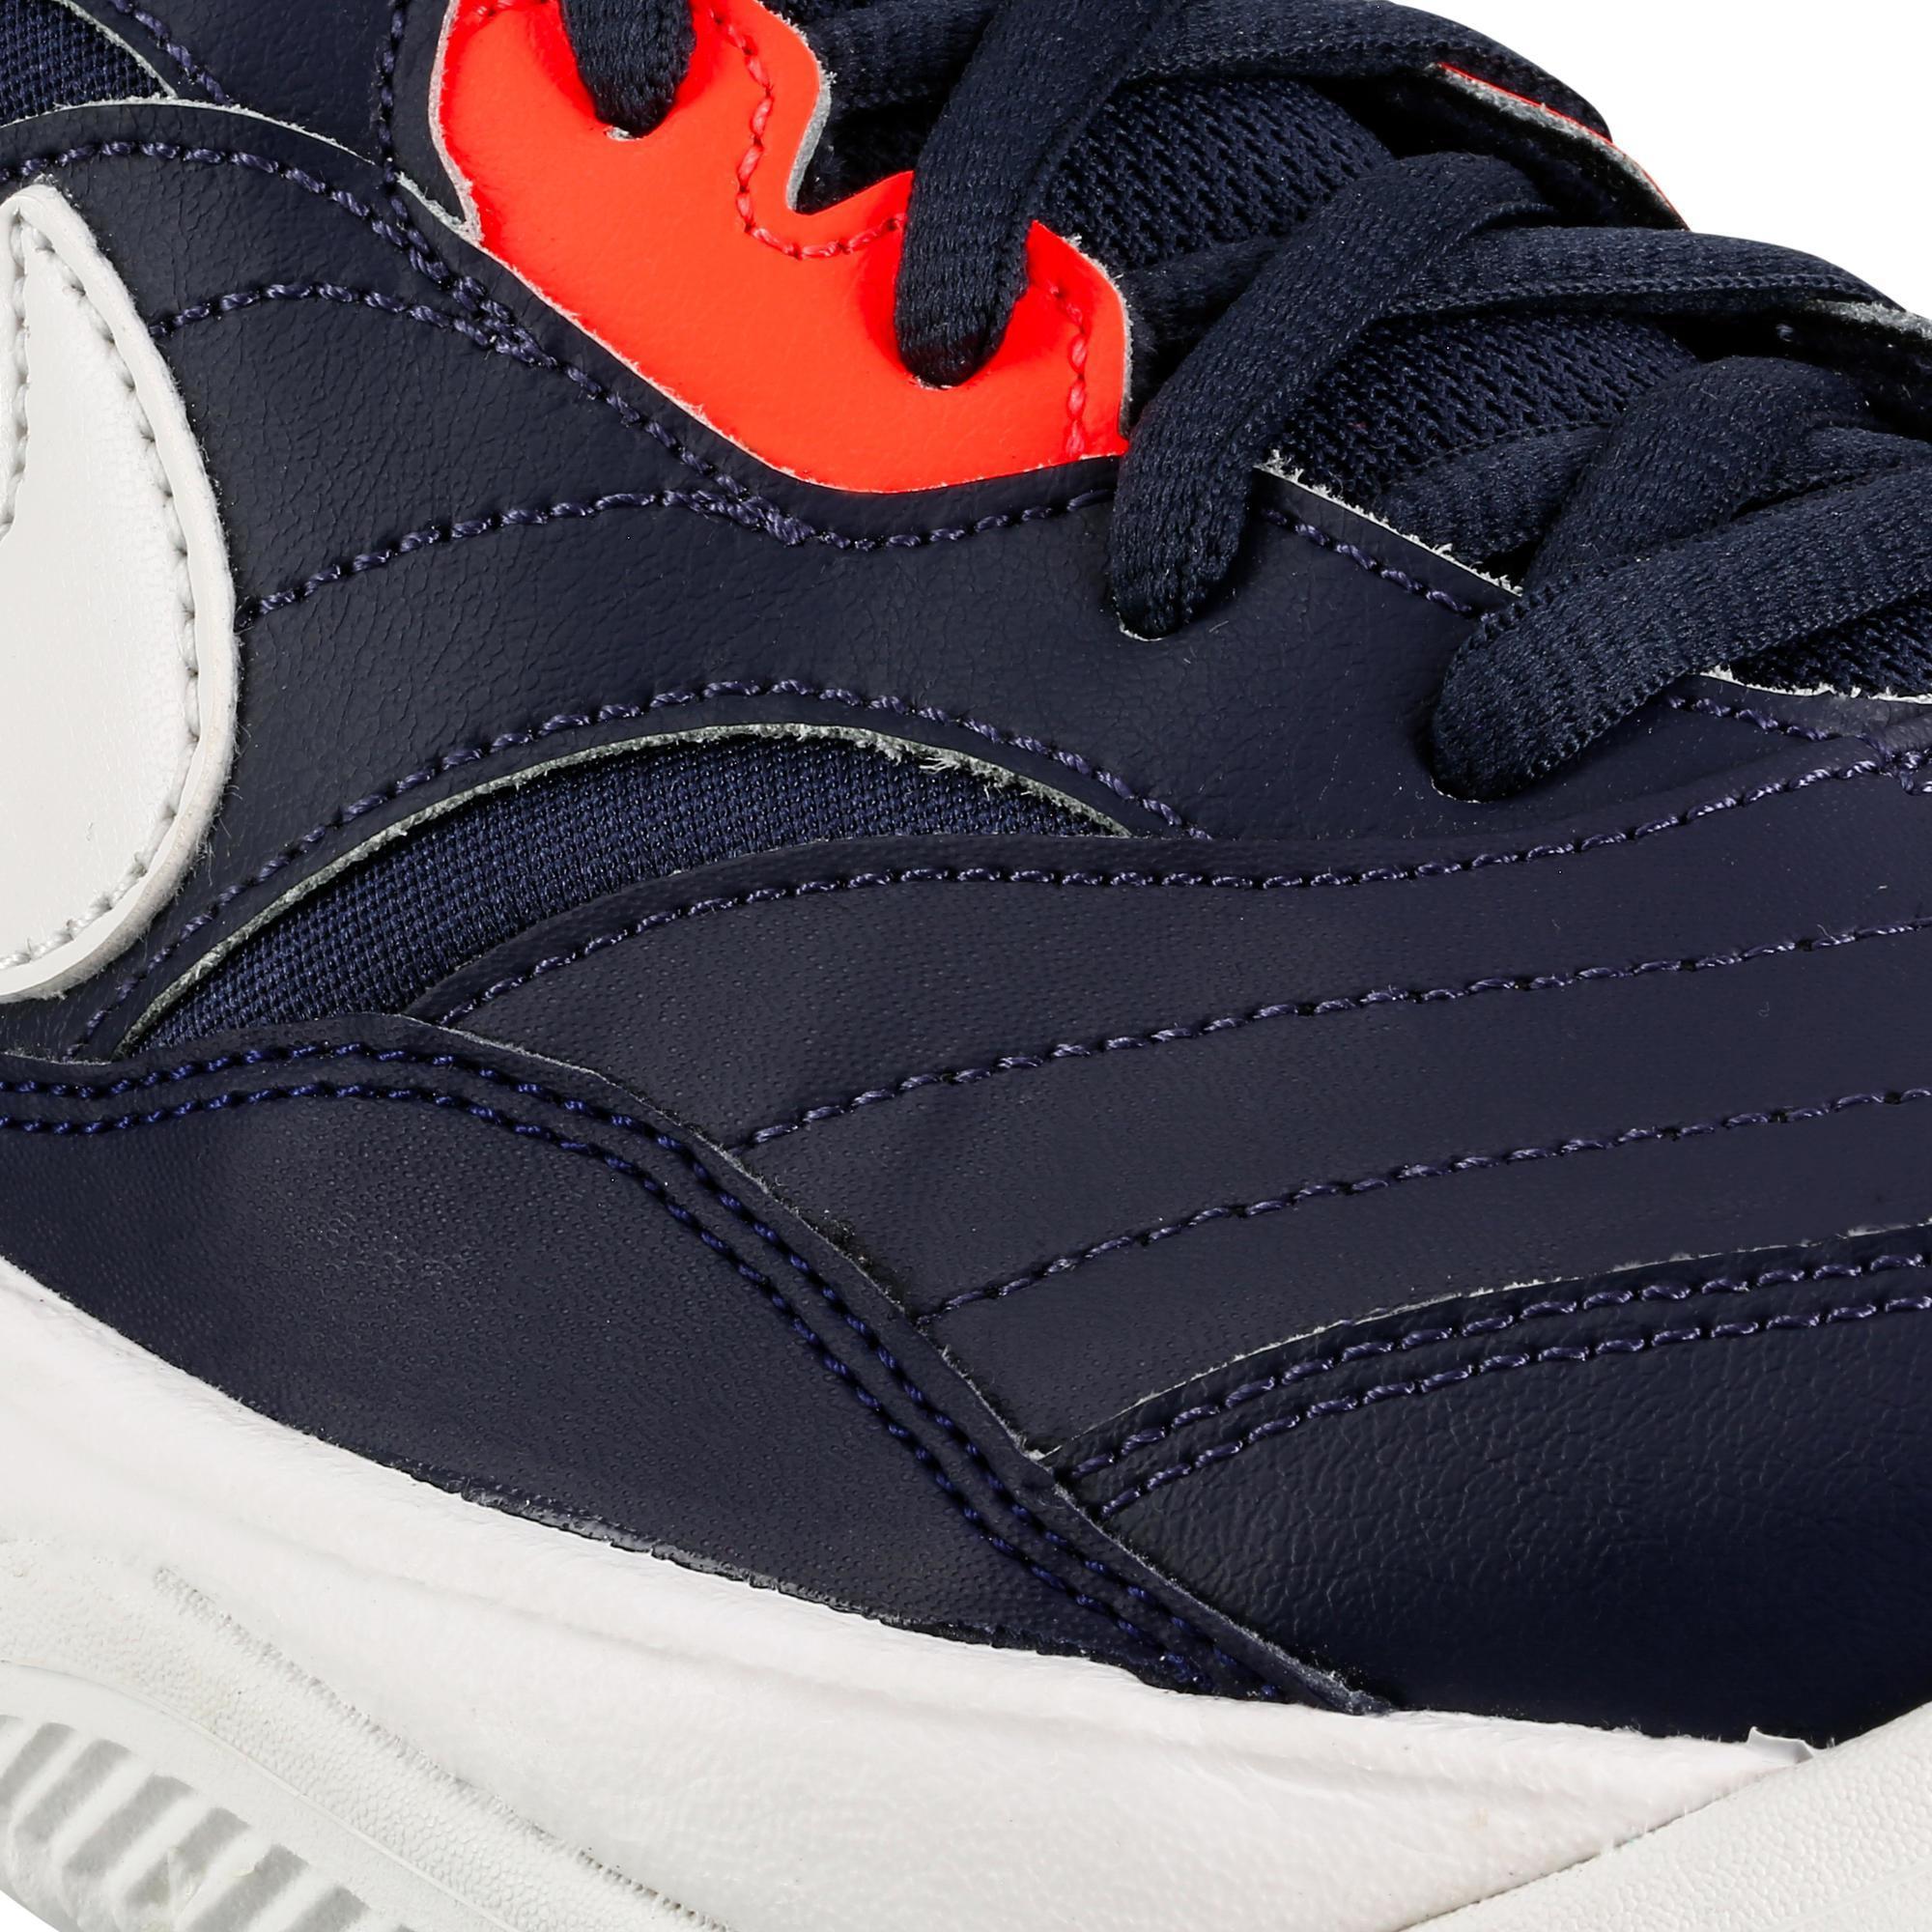 91f536f27342 Battue Chaussures Lite Nike q1tIat Tennis Decathlon Court Bleu Terre wxXIO6I